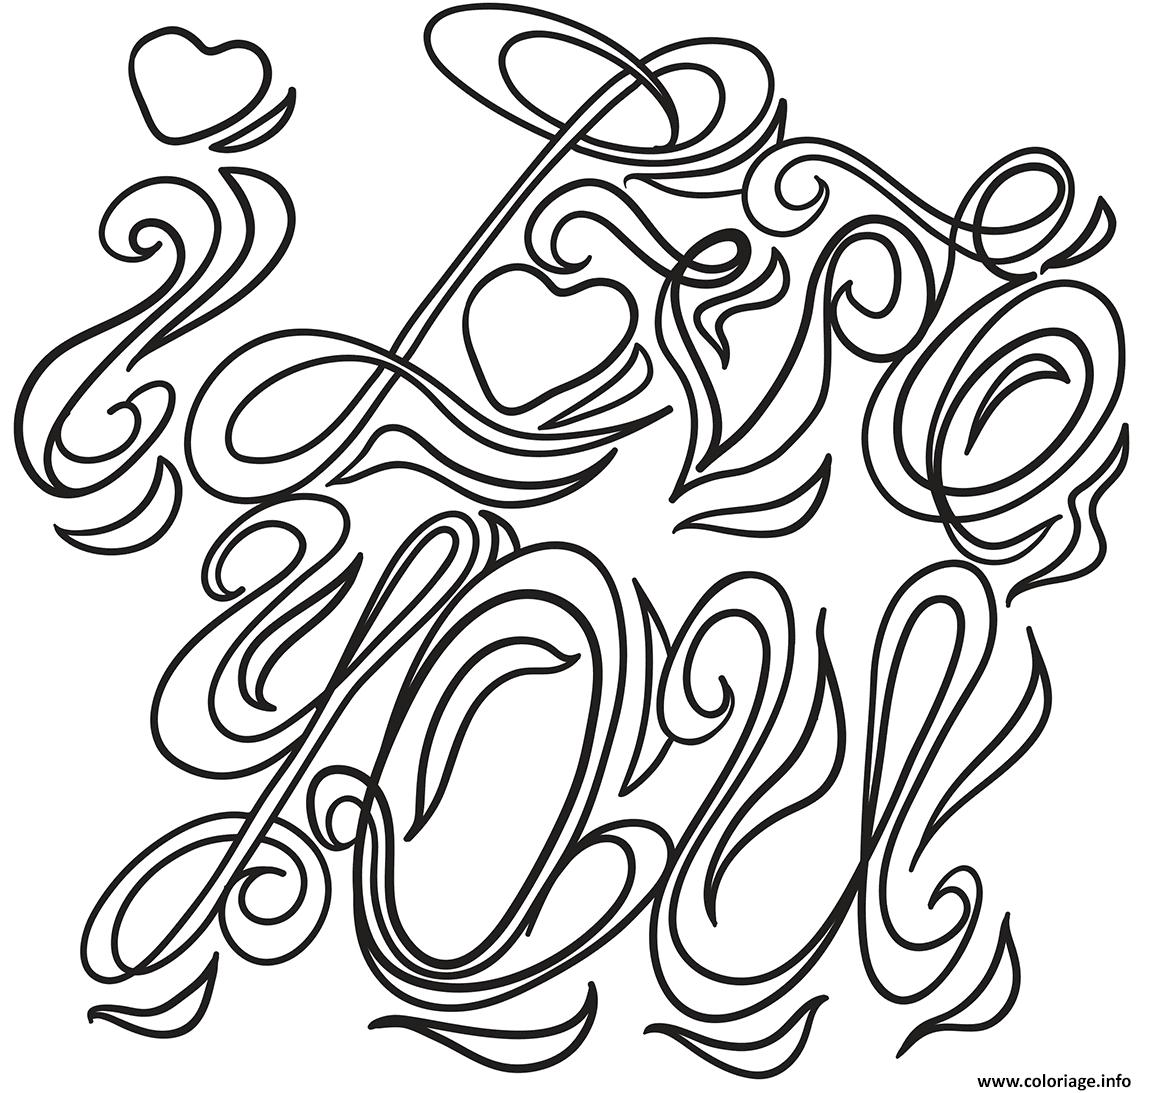 Coloriage I Love You Saint Valentin Dessin